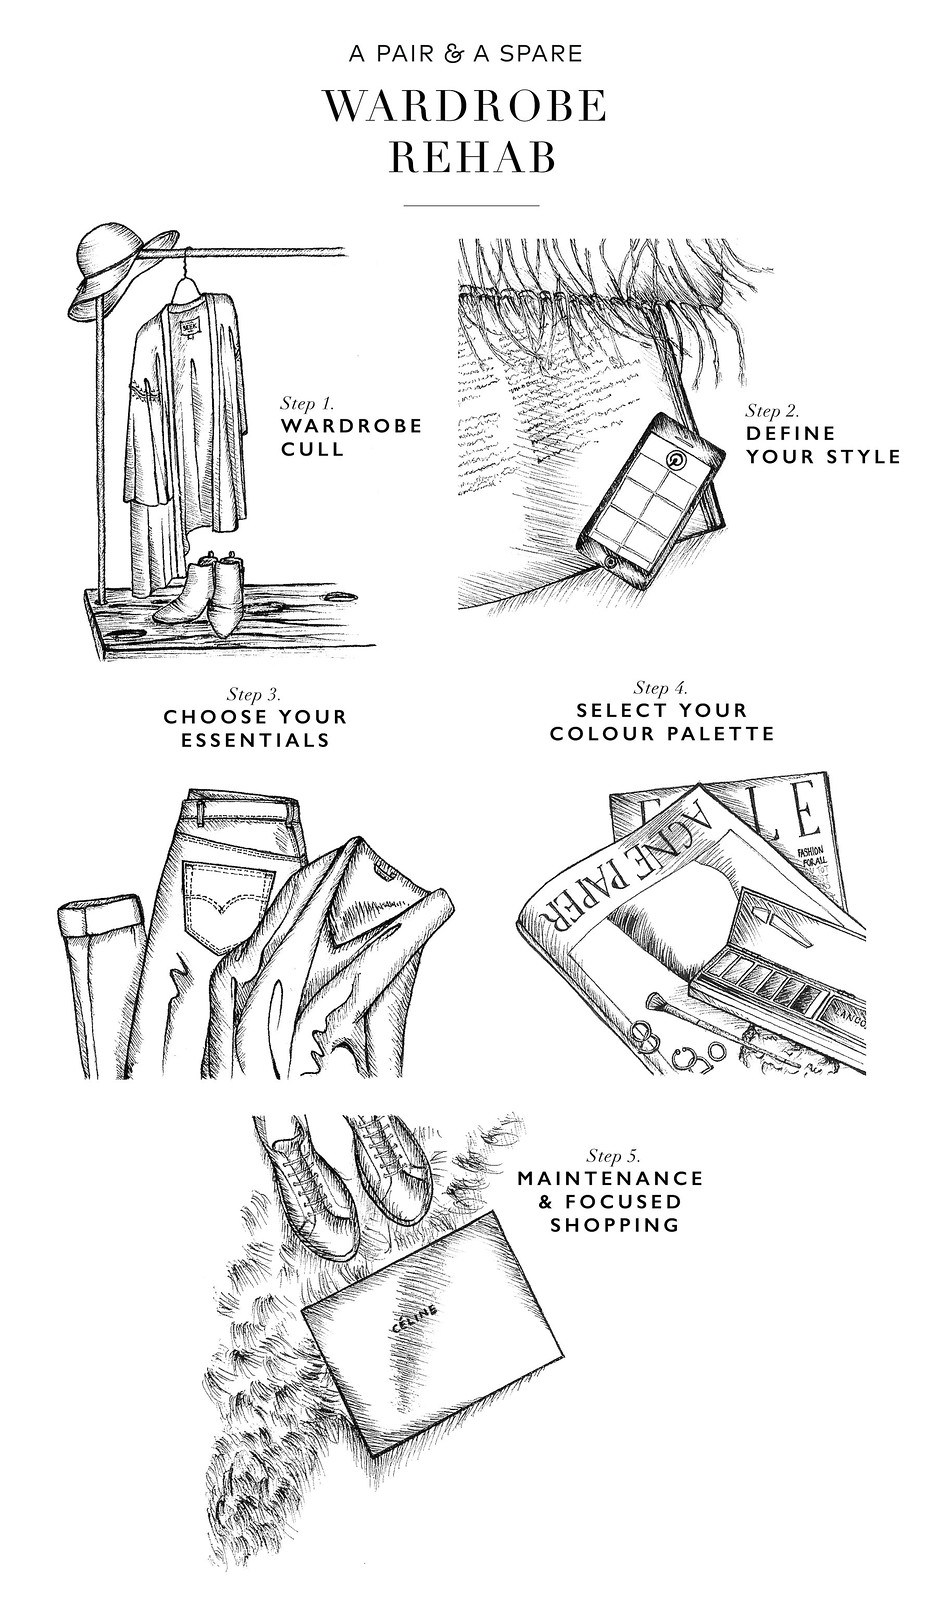 Wardrobe Rehab The Perfect Wardrobe Essentials: Wardrobe Rehab: 5 Steps To Perfecting Your Closet (Also